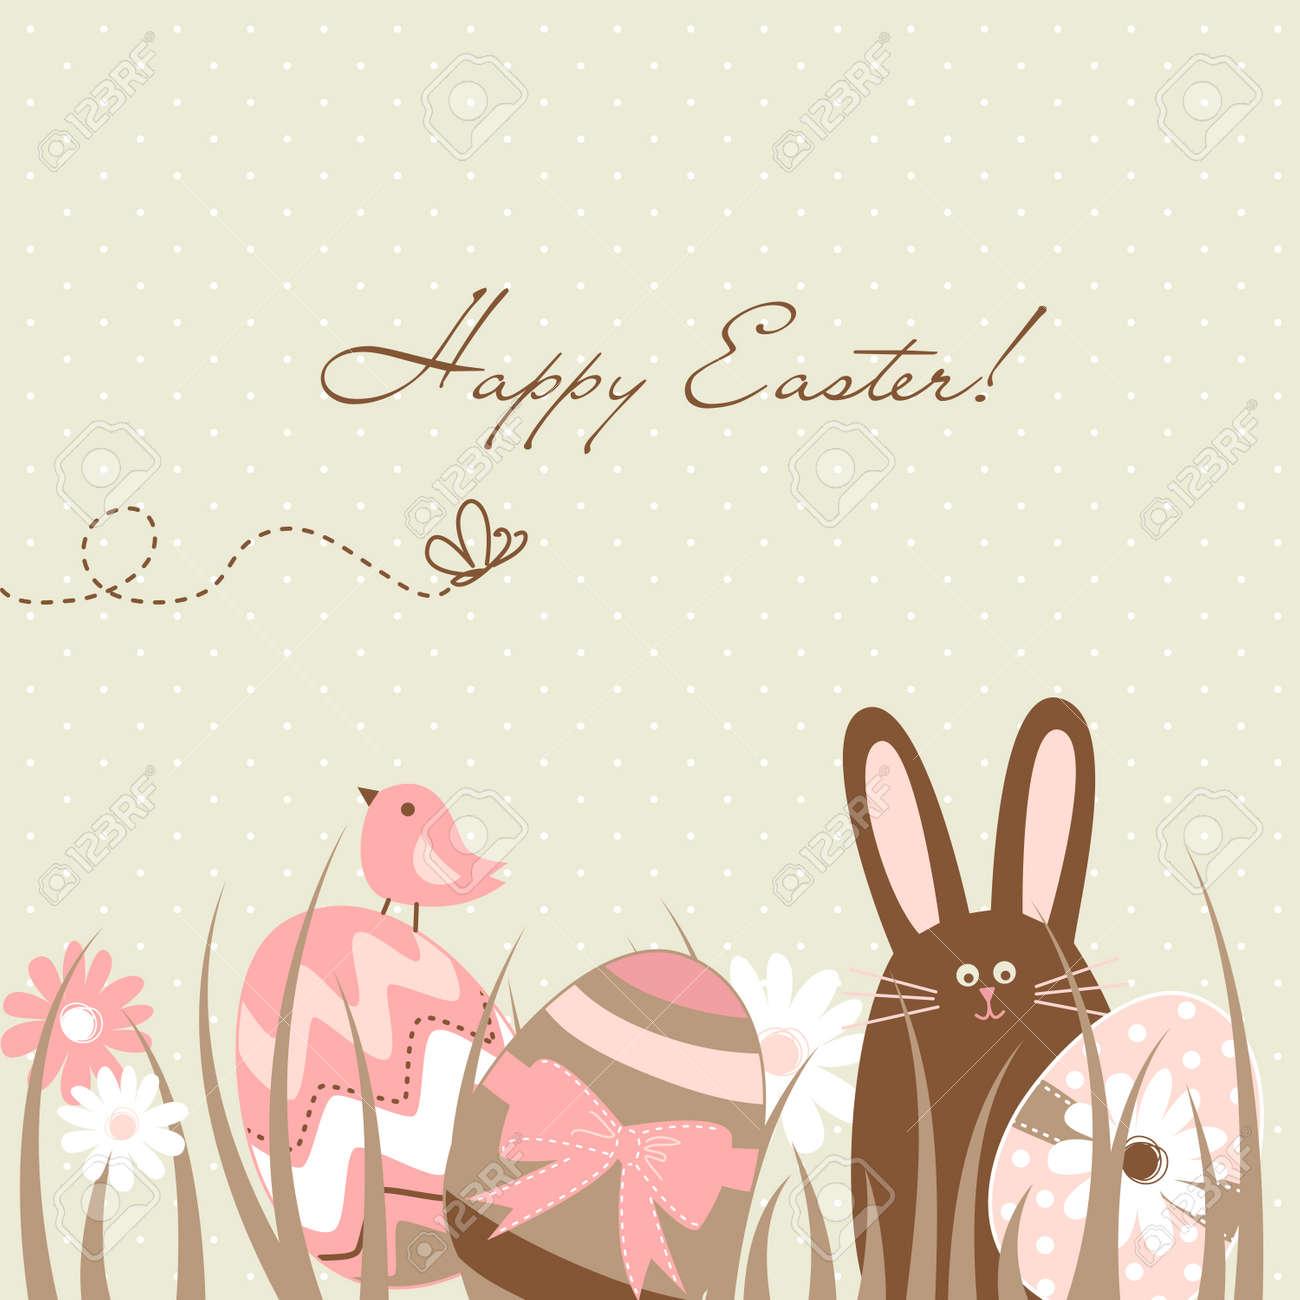 Cute Easter Egg Card Stock Vector - 13346938